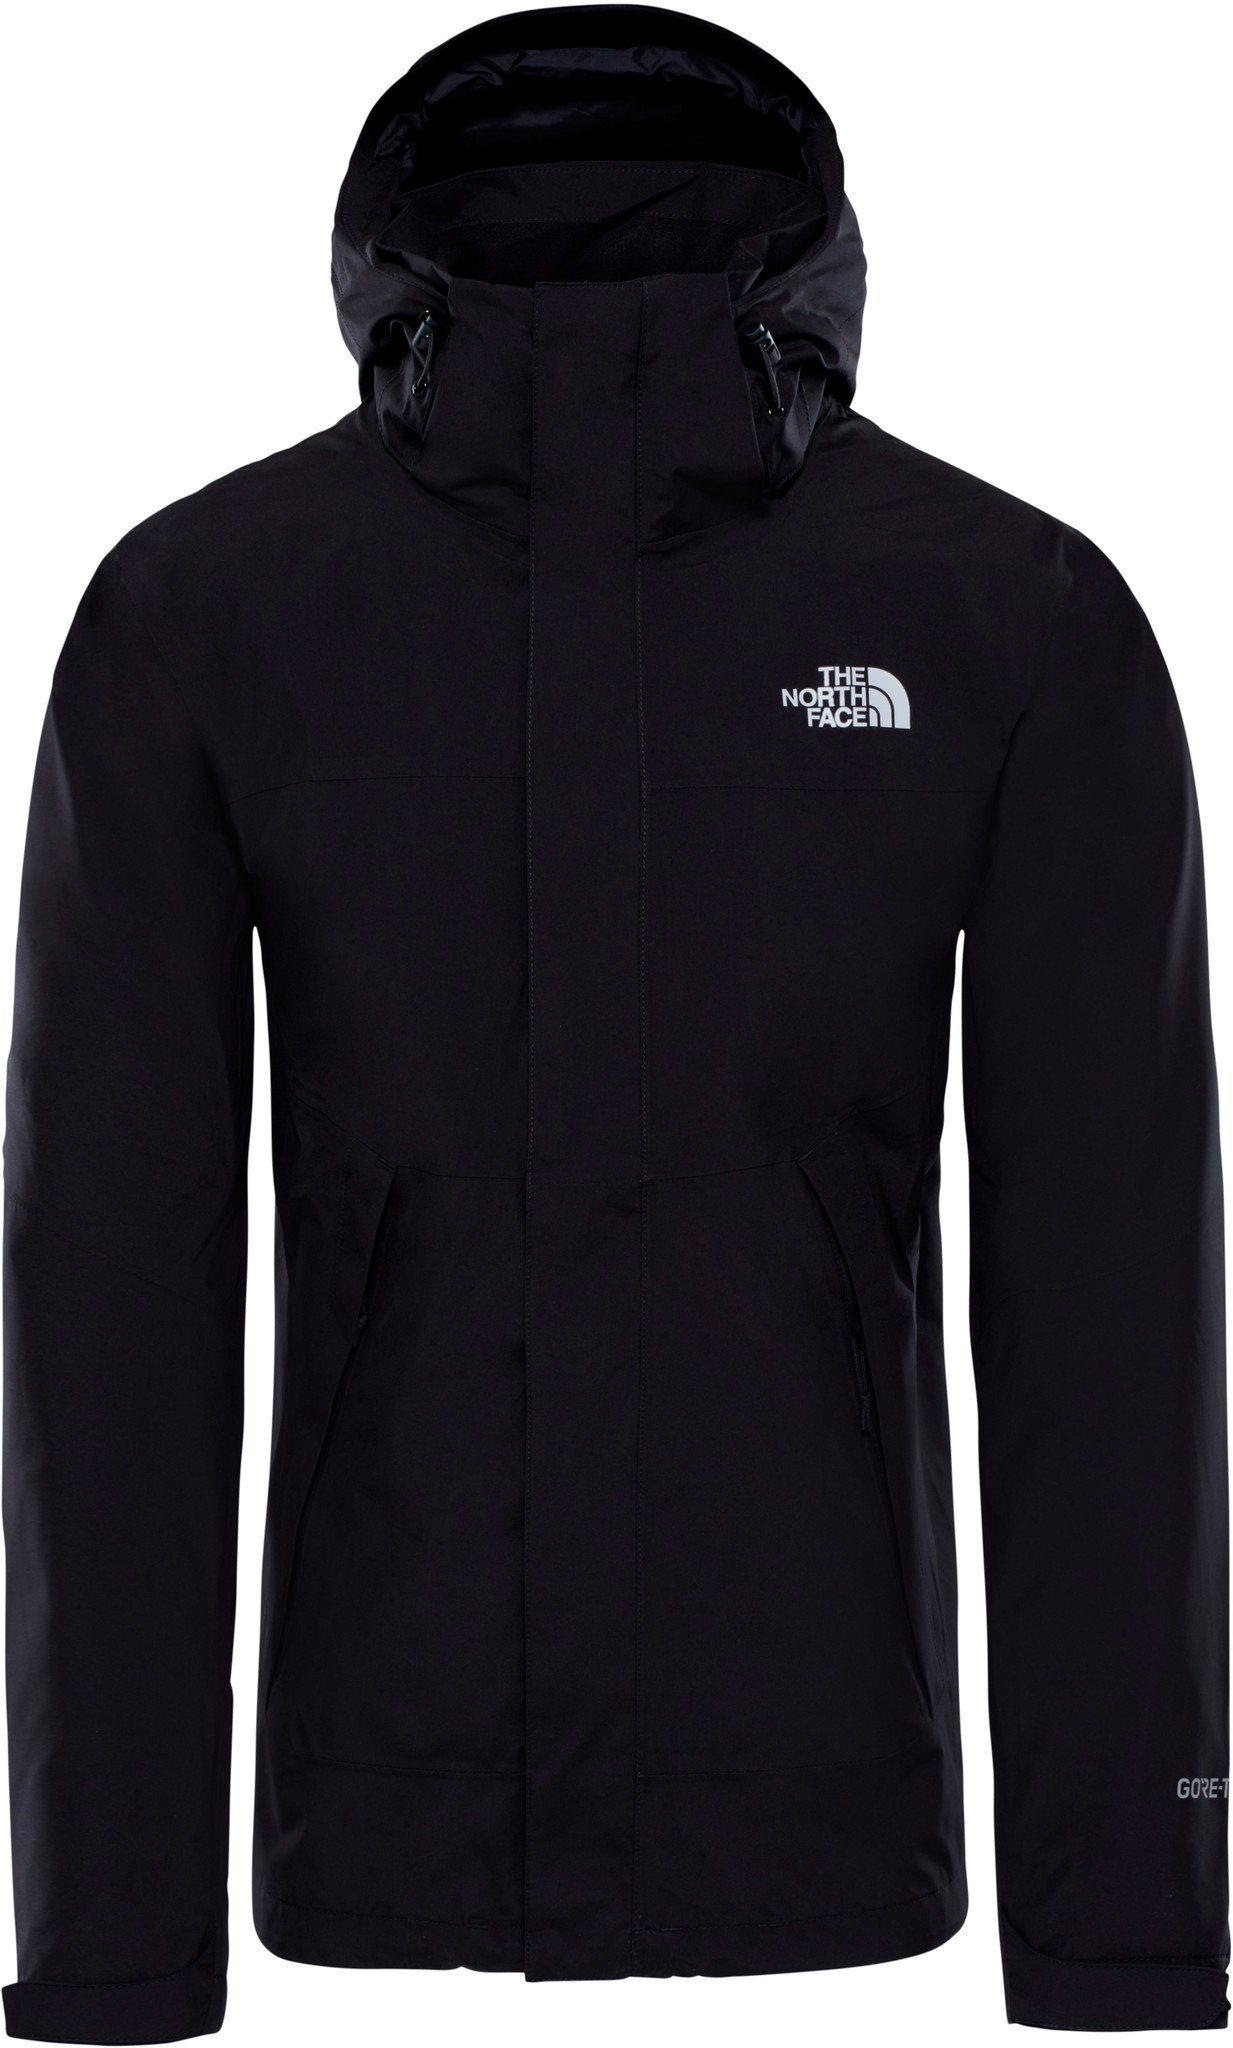 Herren The North Face Outdoorjacke Mountain Light II Shell Jacket Men schwarz | 00191478132215